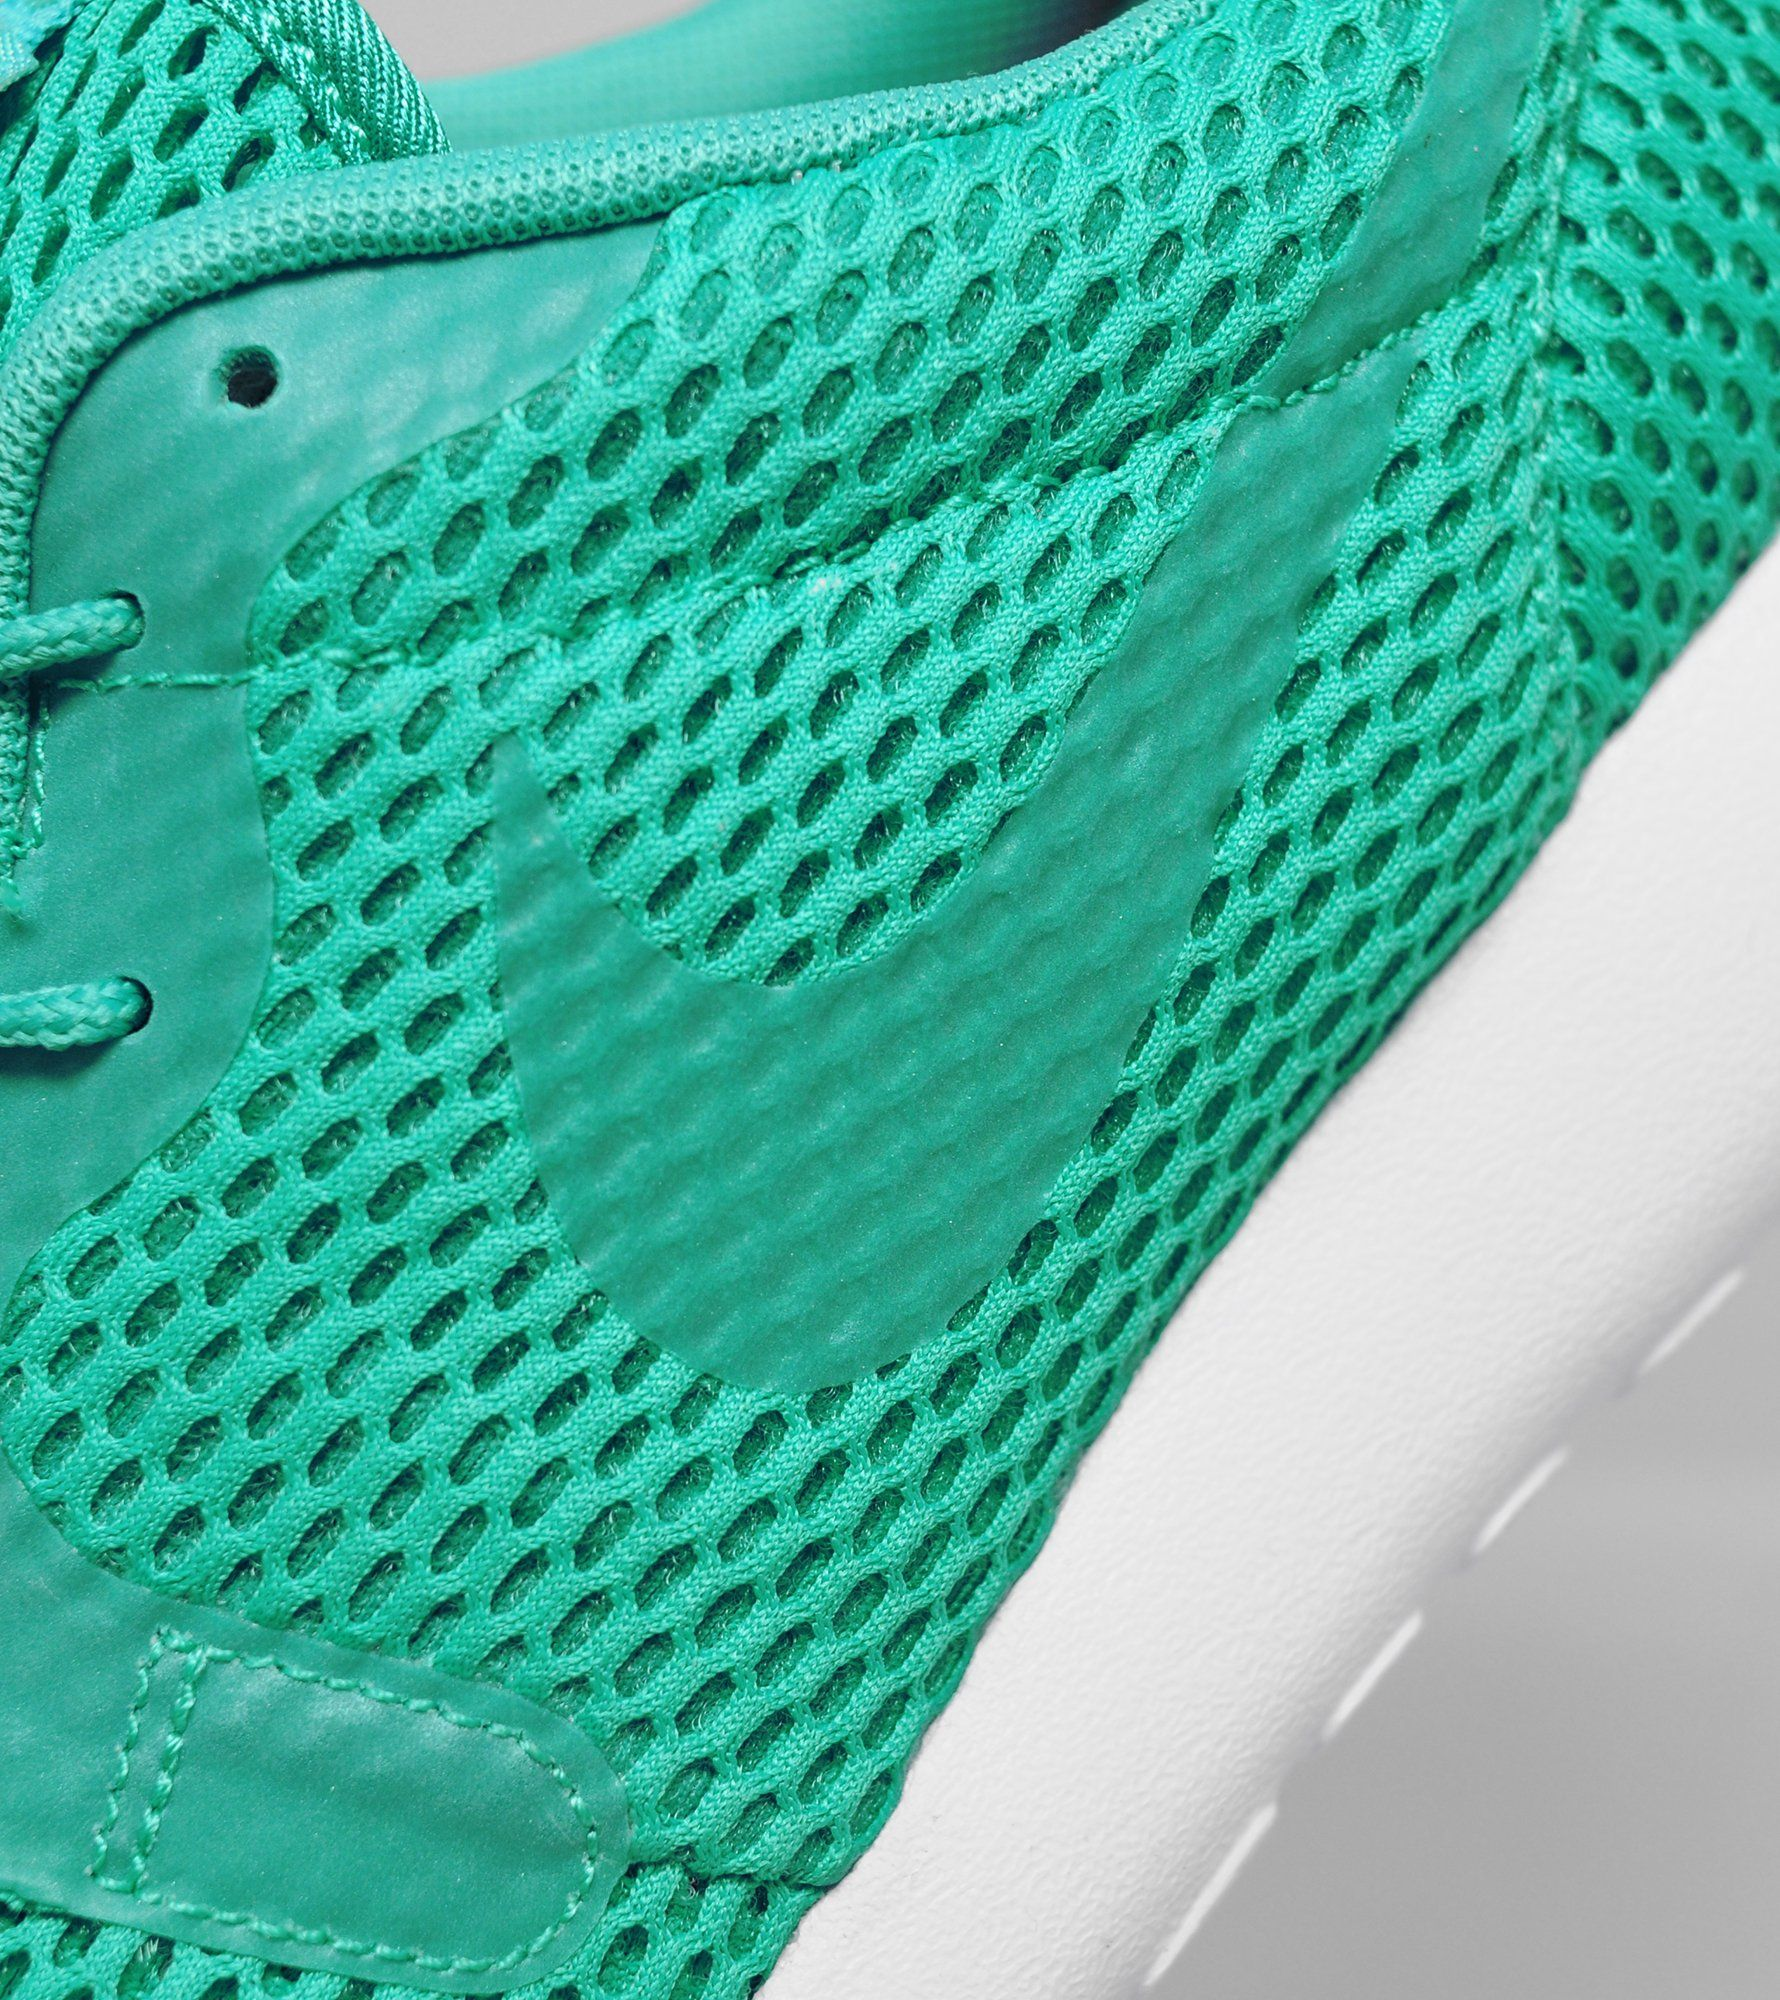 hpacu Nike Roshe One Hyperfuse \'Breathe\' | Size?